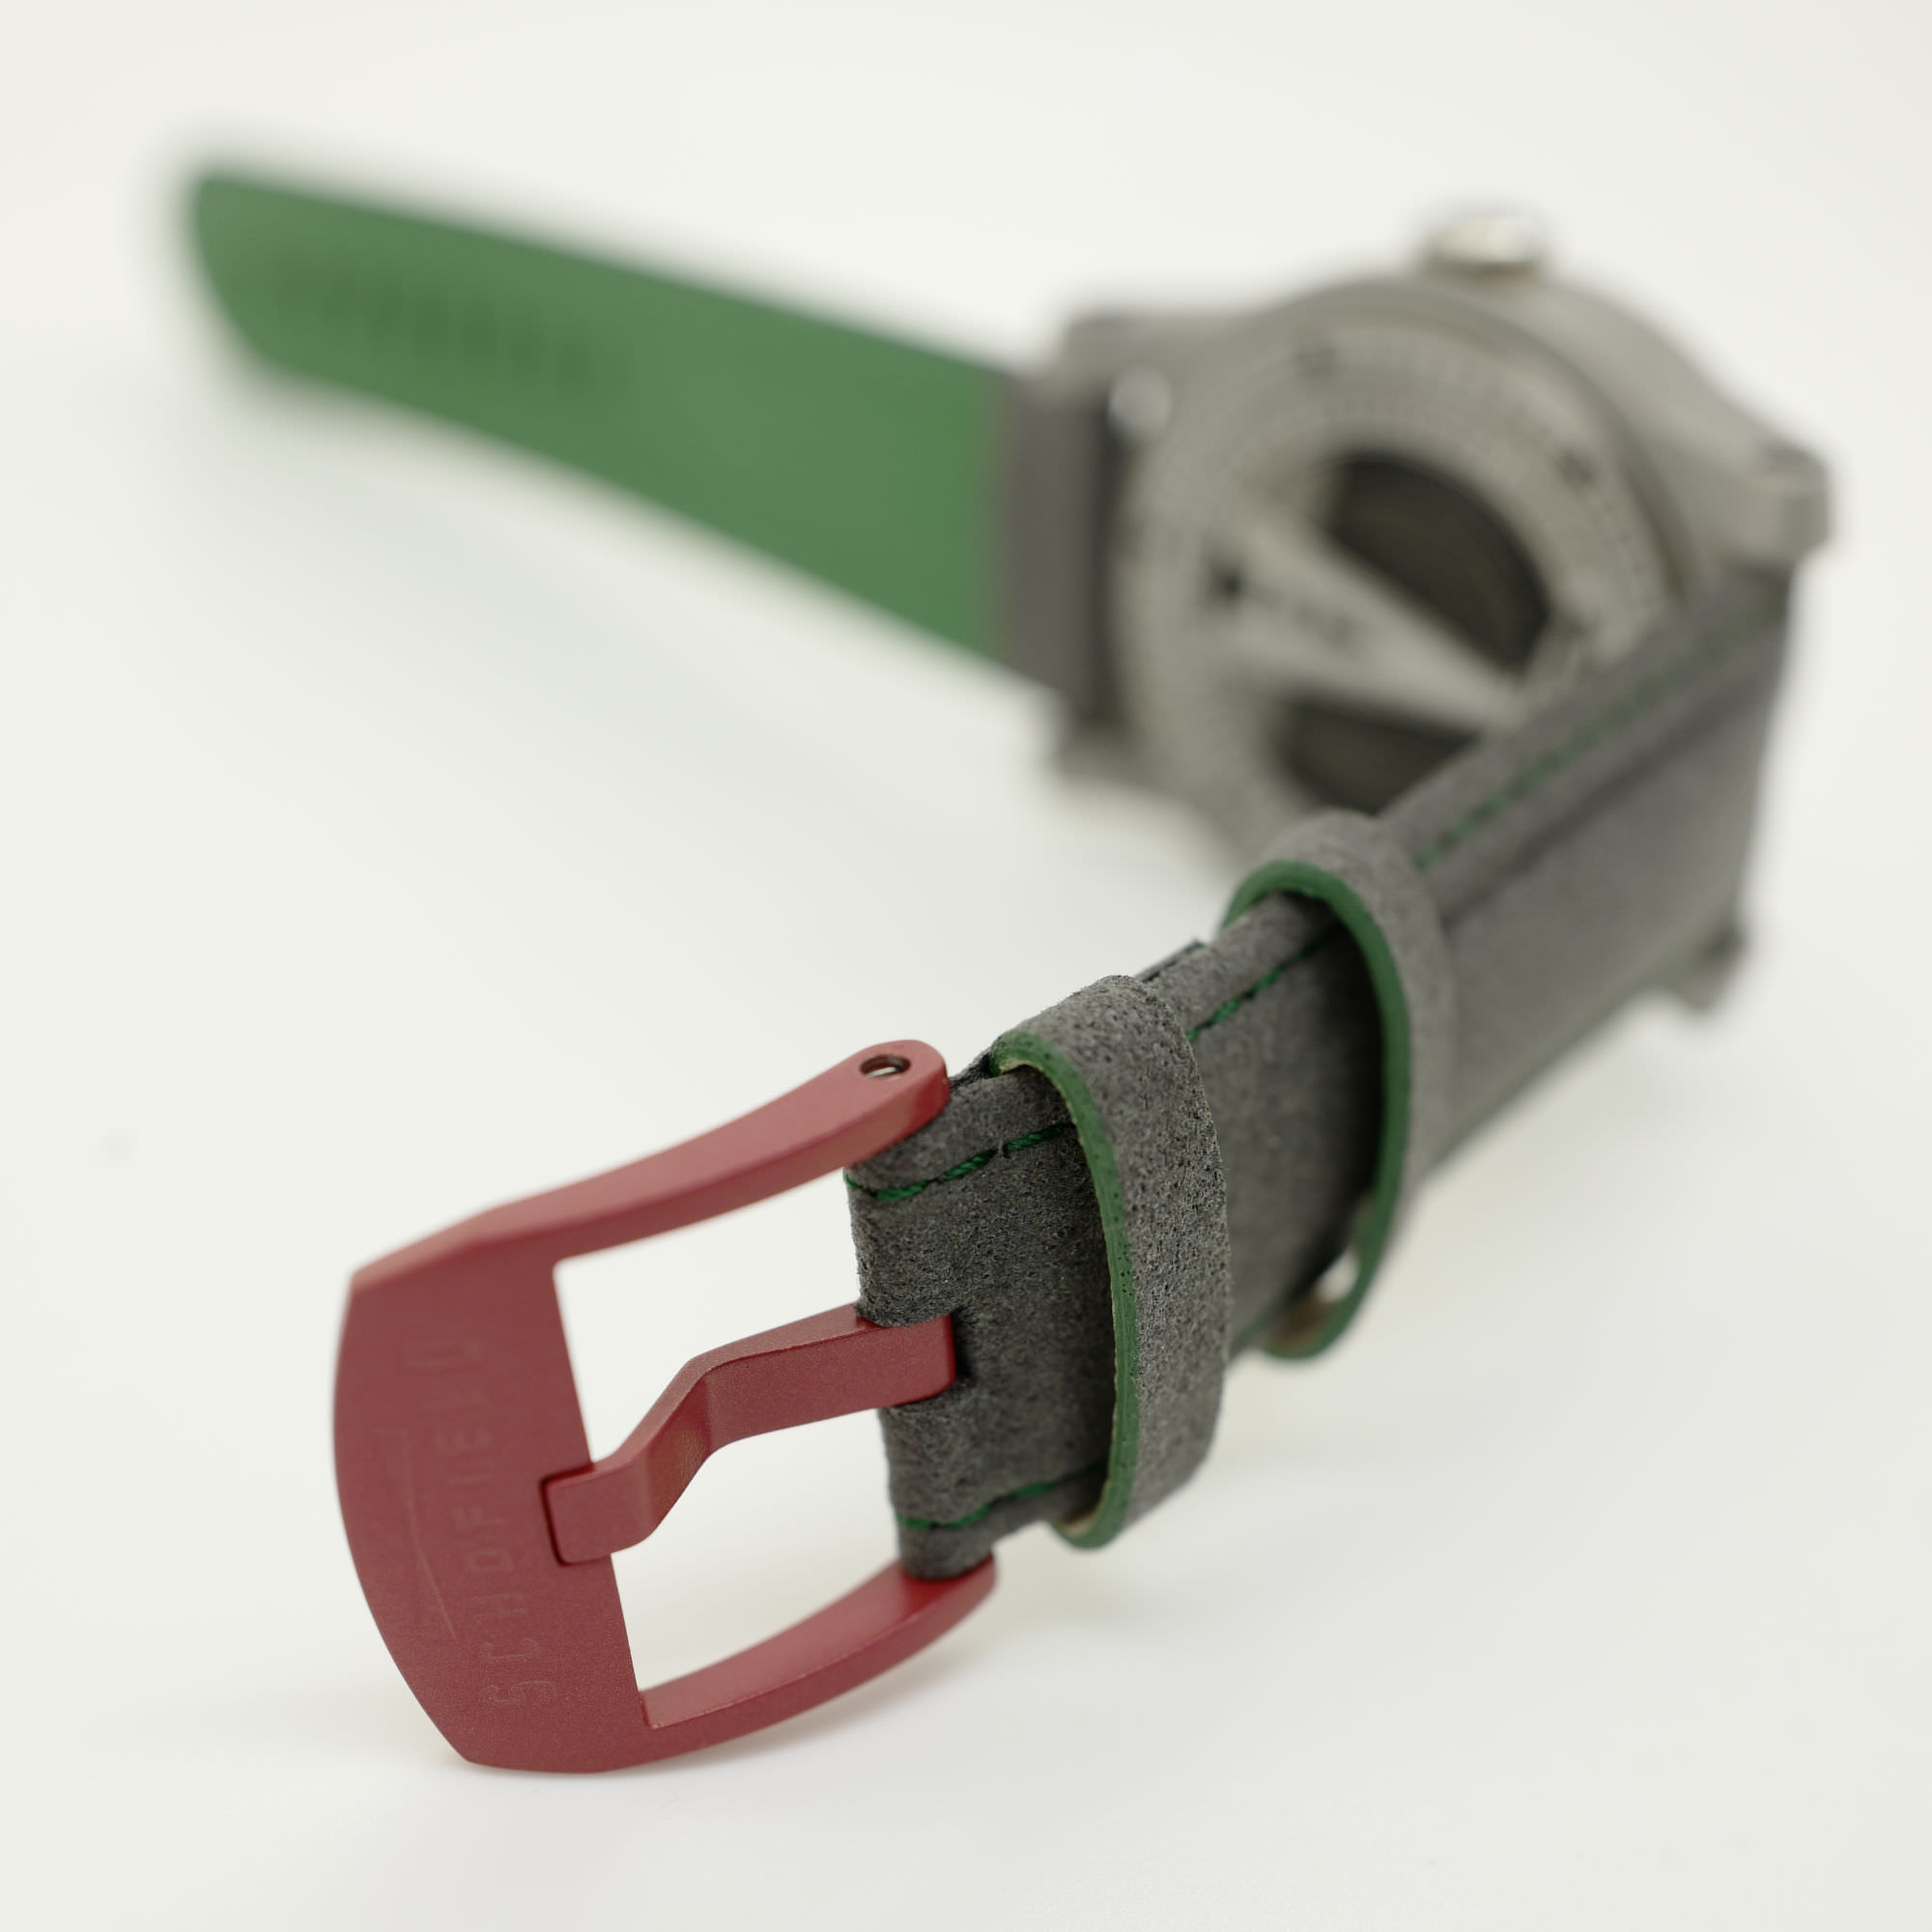 Super Nap strap red buckle